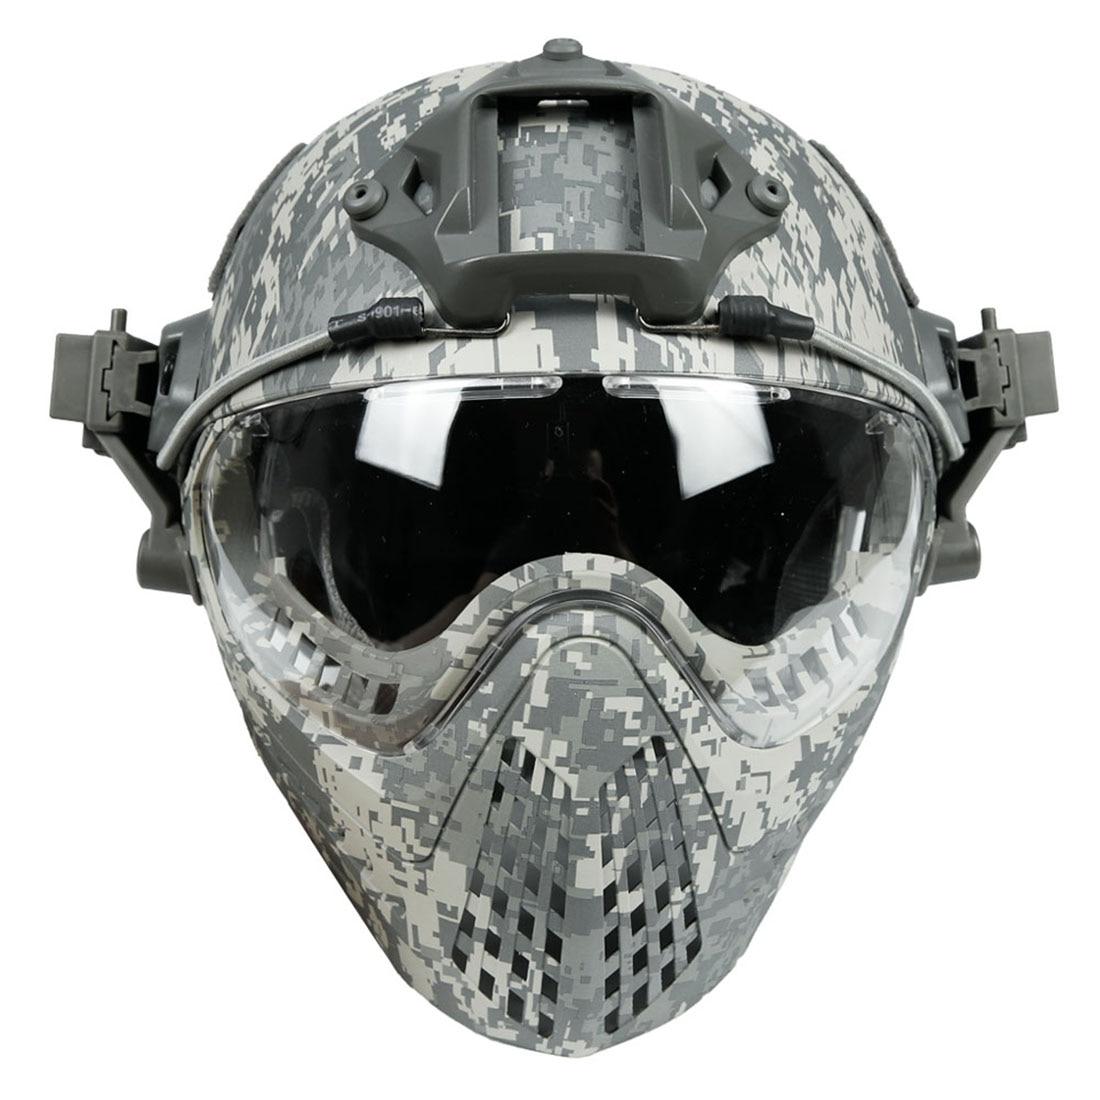 WST Navigator Tactics Camouflage Protecting Helmet for Outdoors Activities - ACU Type M rainbow pattern pet dog necktie acu camouflage